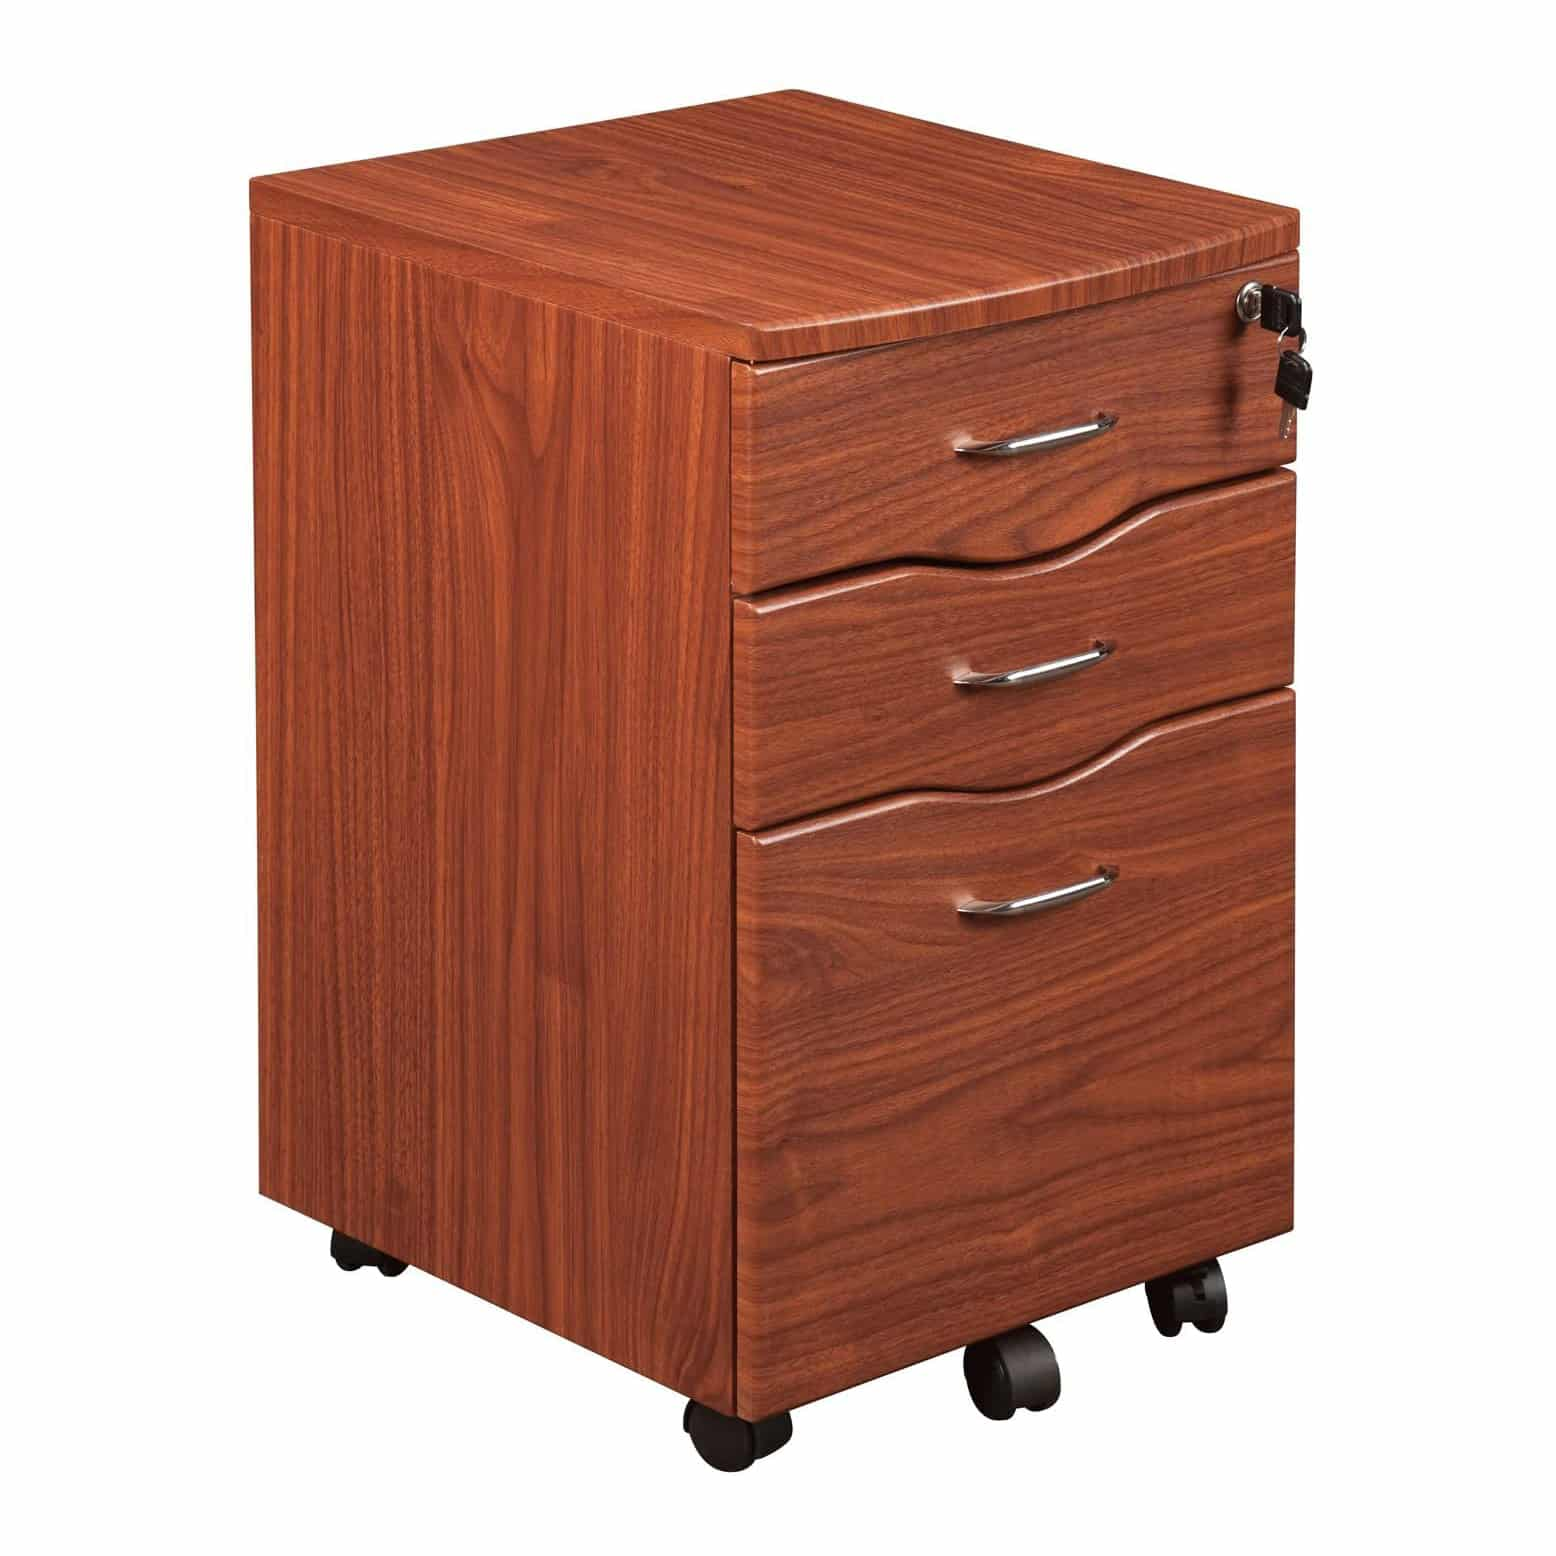 Techni Mobili File Cabinet and Rolling Storage, Mahogany